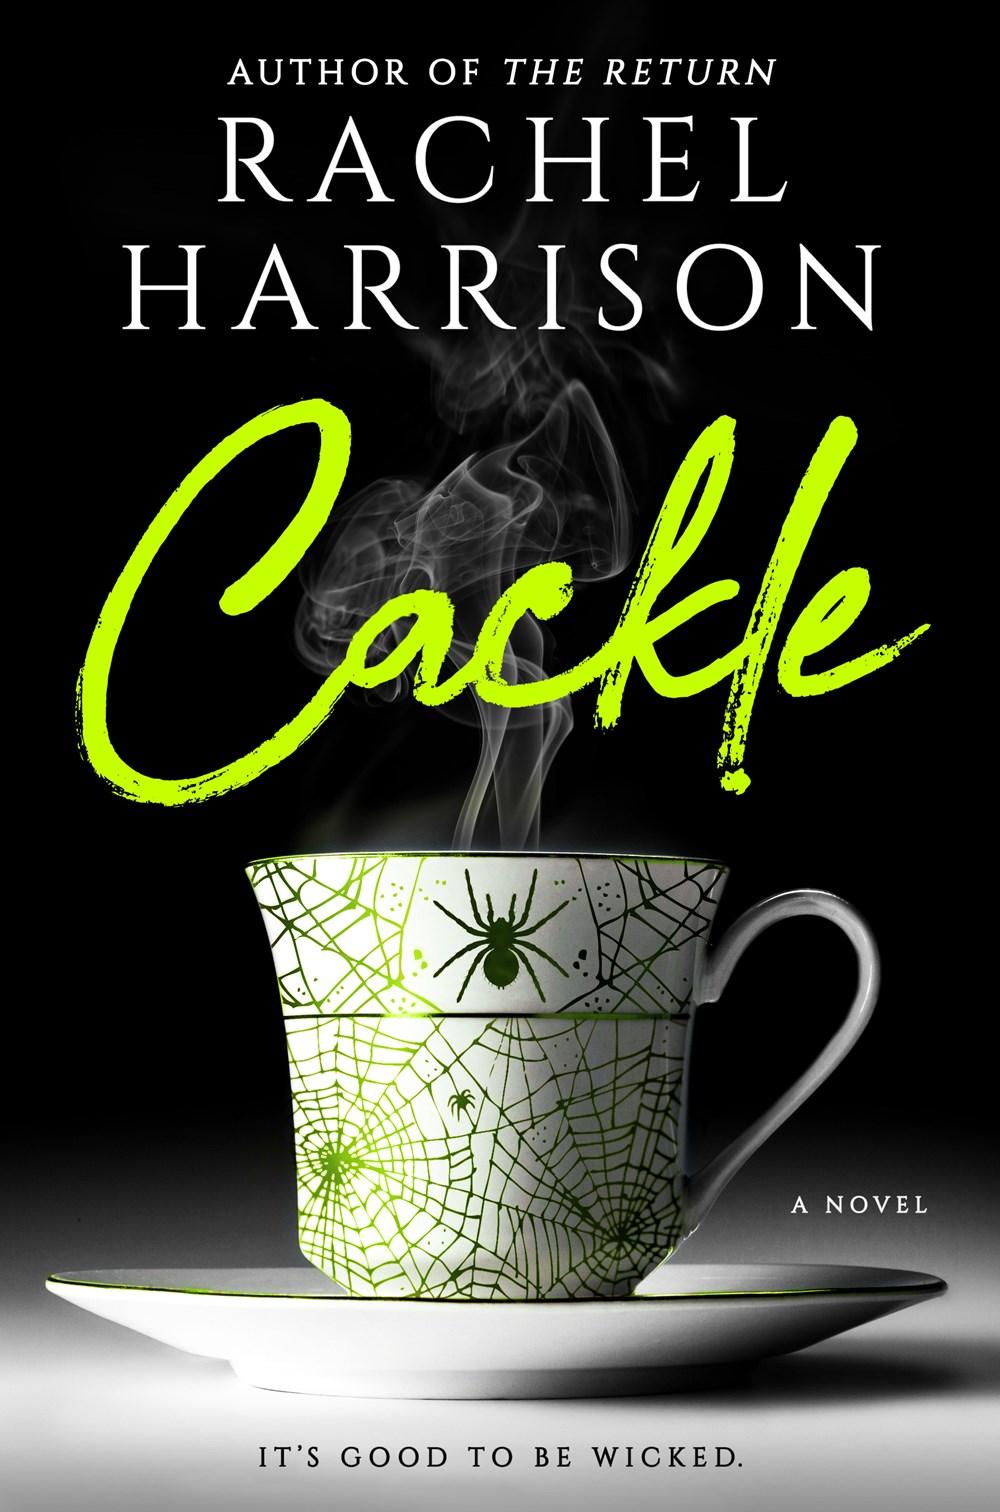 Cackle by Rachel Harrison